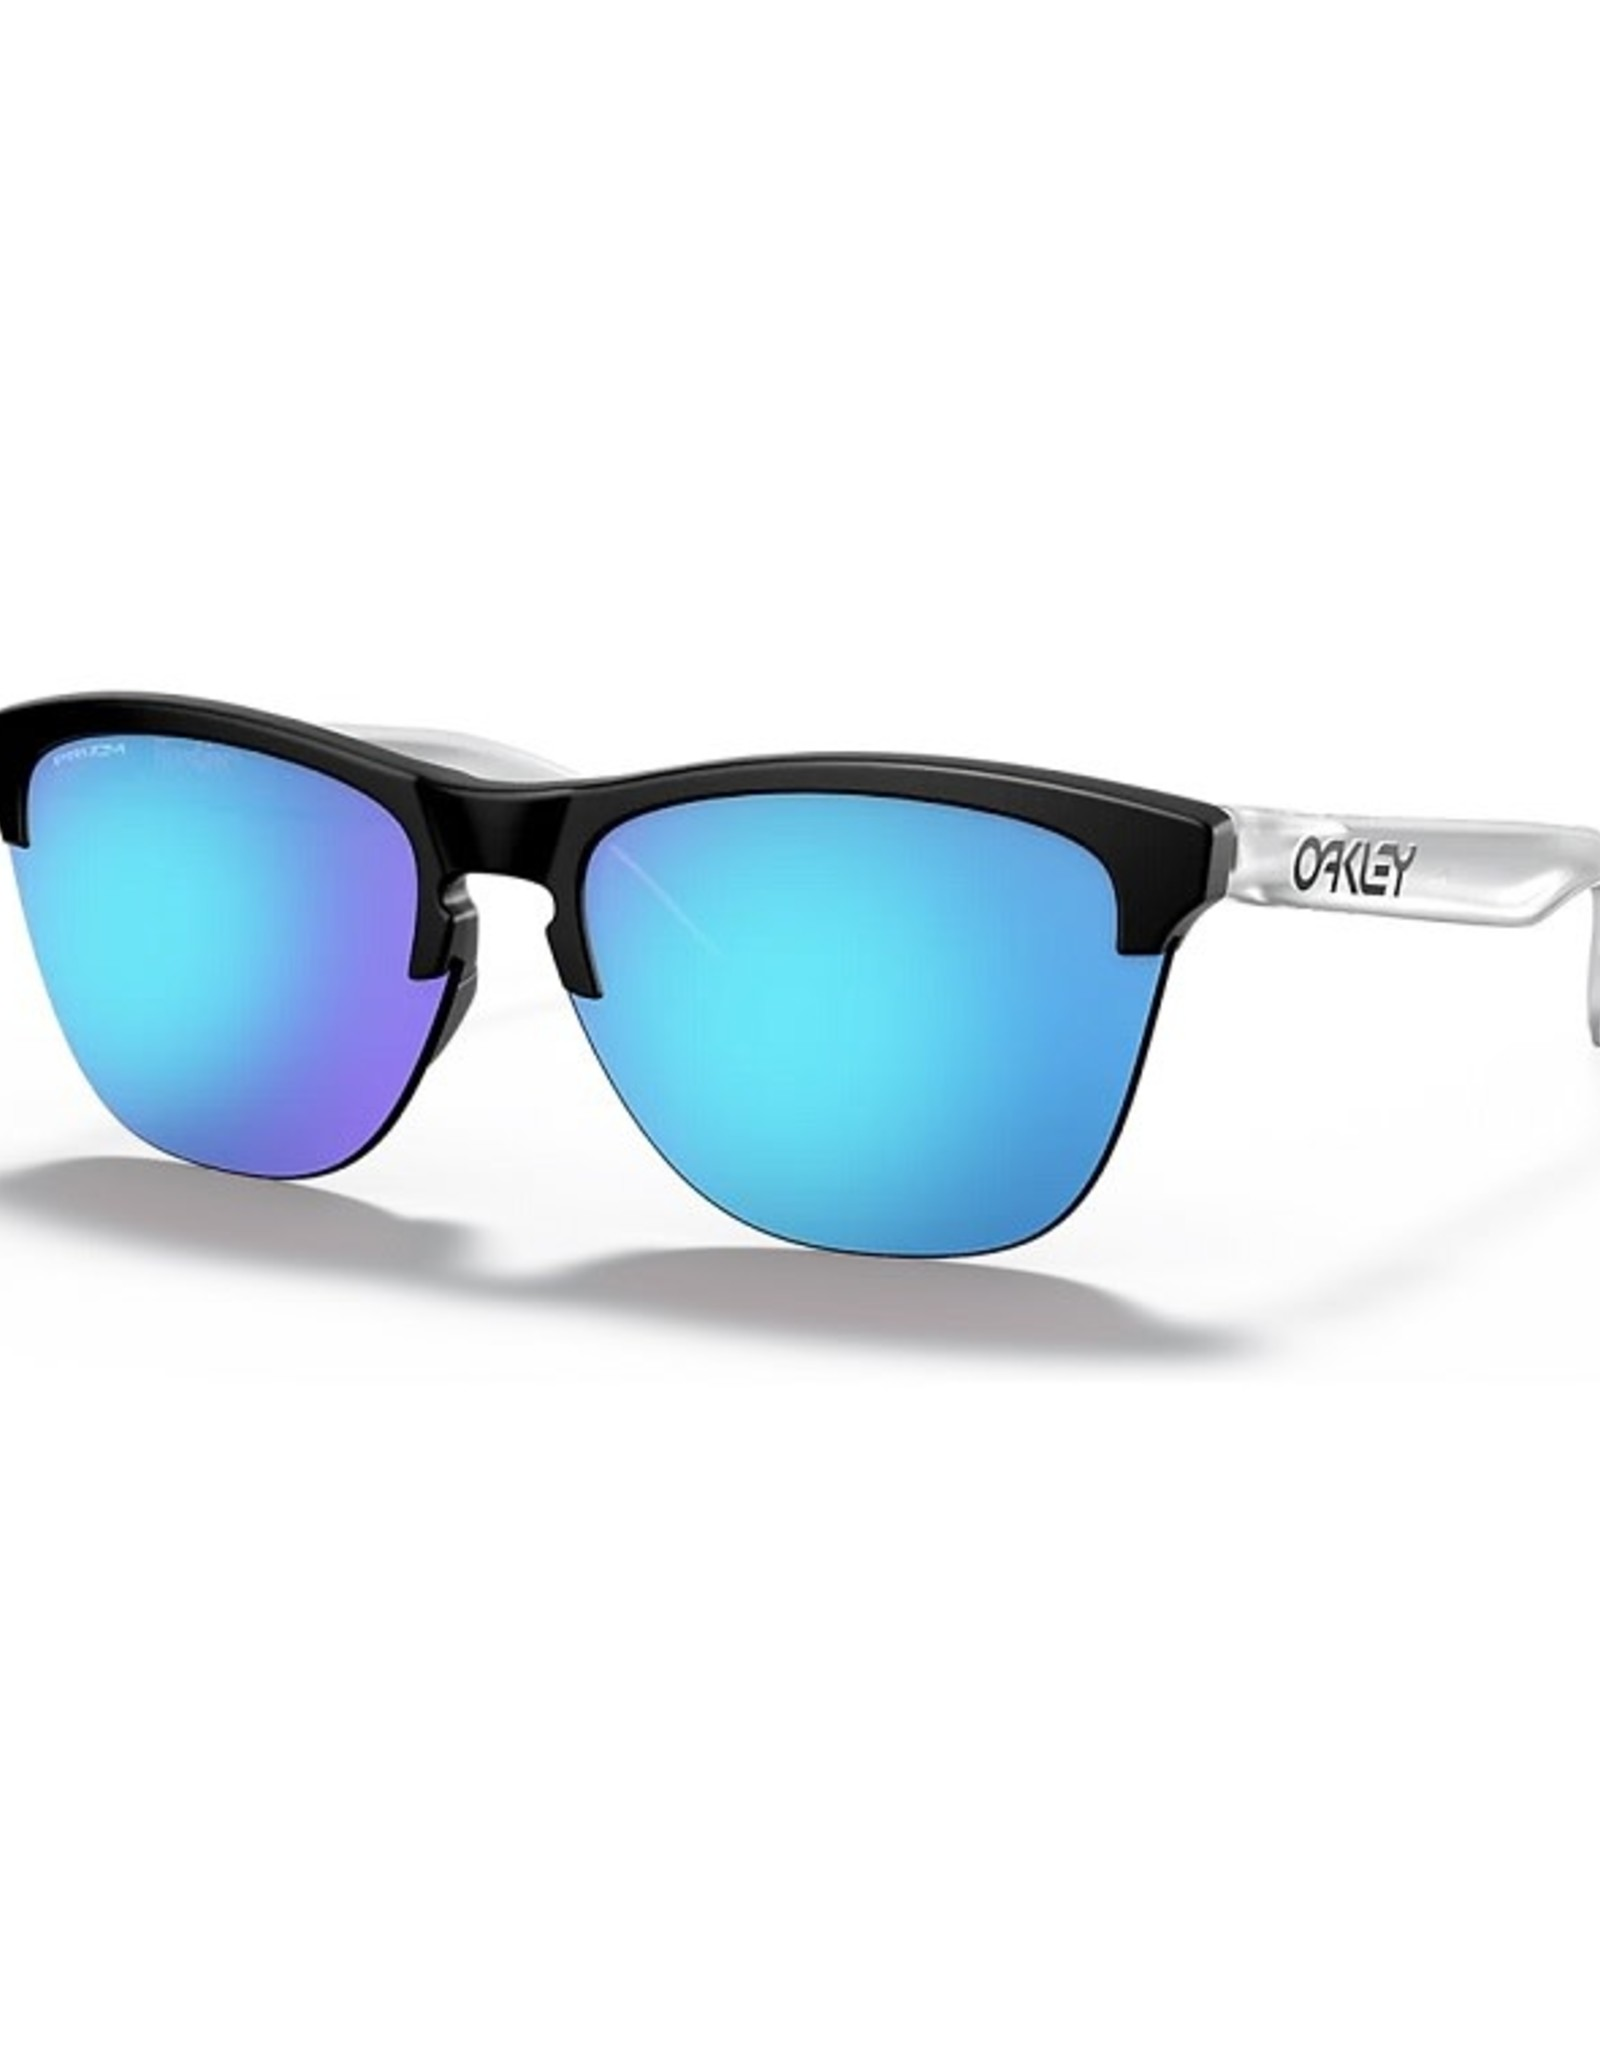 Oakley FROGSKINS LITE Matte Black/Matte Clear, Prizm Sapphire Iridium